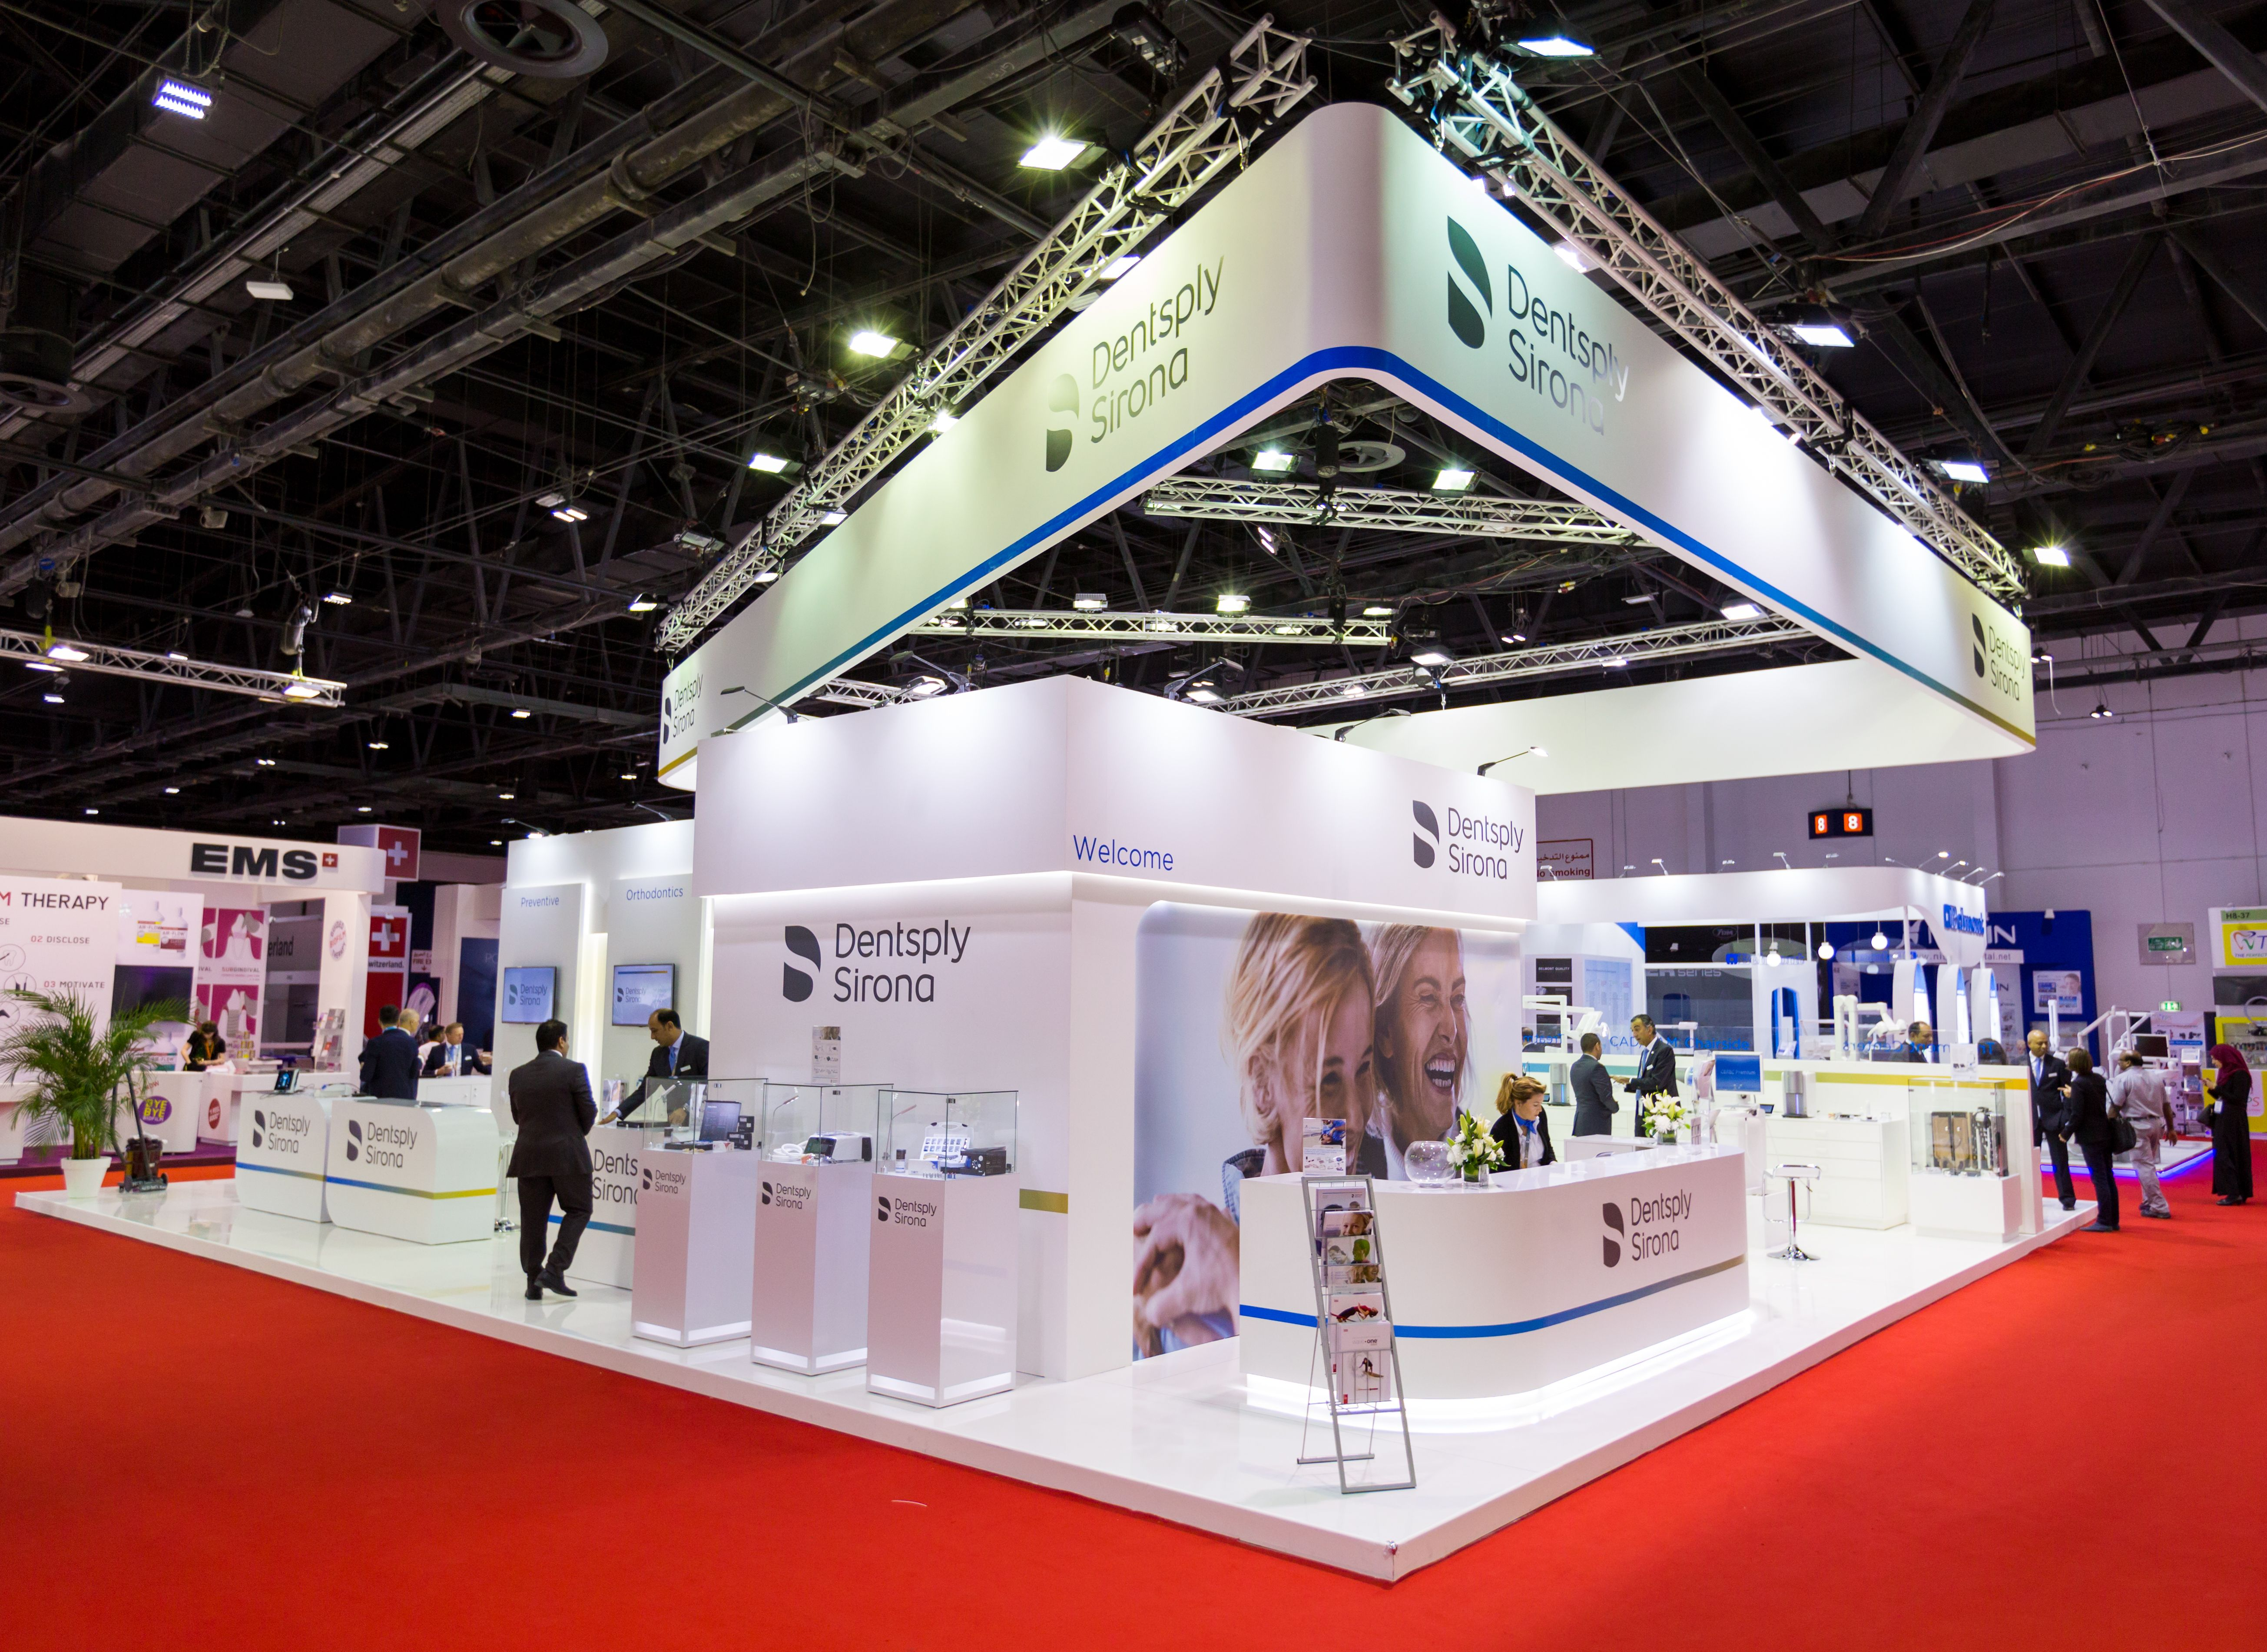 Asiatic Expo Exhibition Stand Design Amp Build : R e d international exhibition management